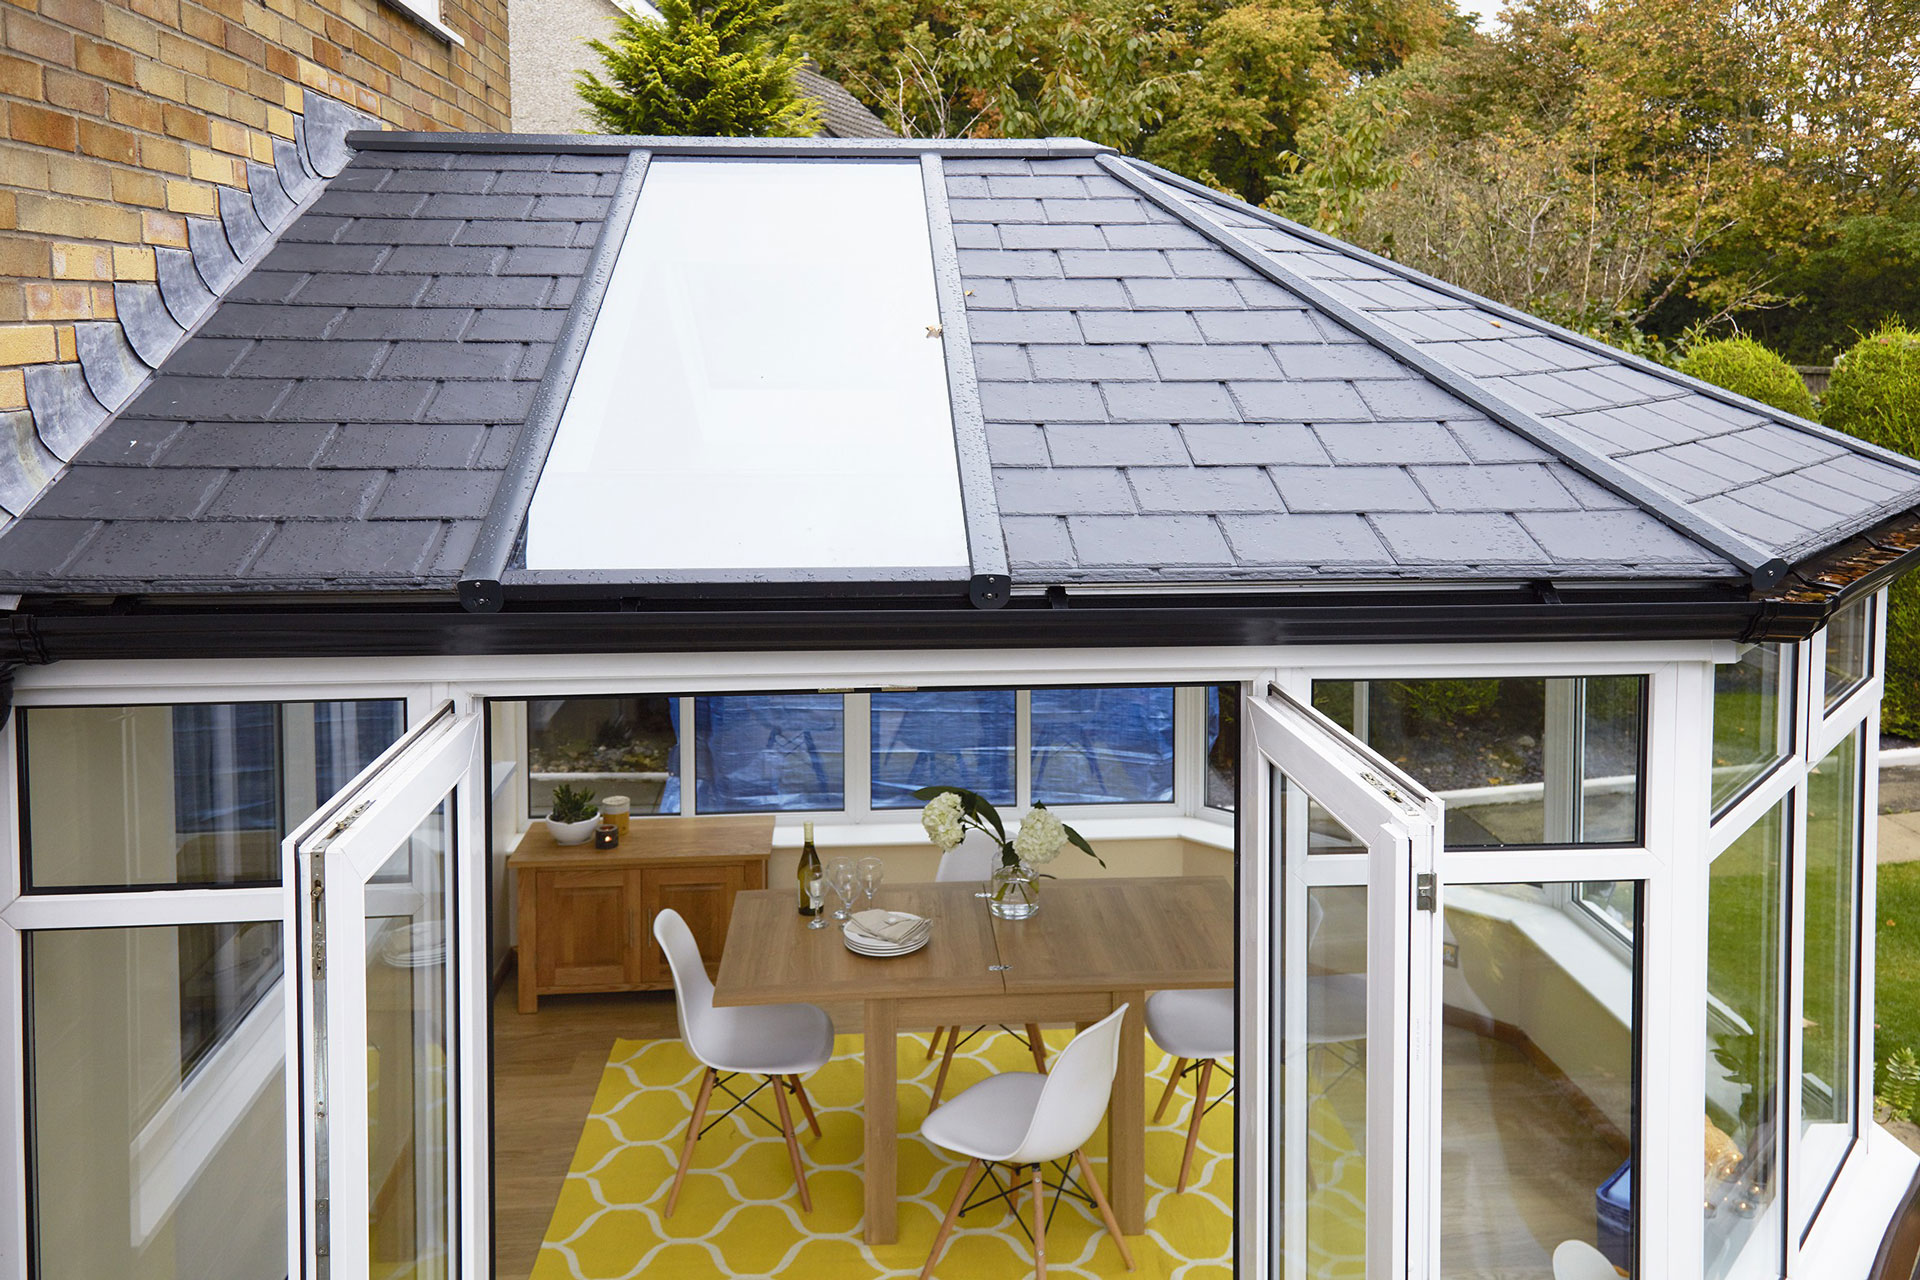 Ultraframe Conservatory Tiled Roof